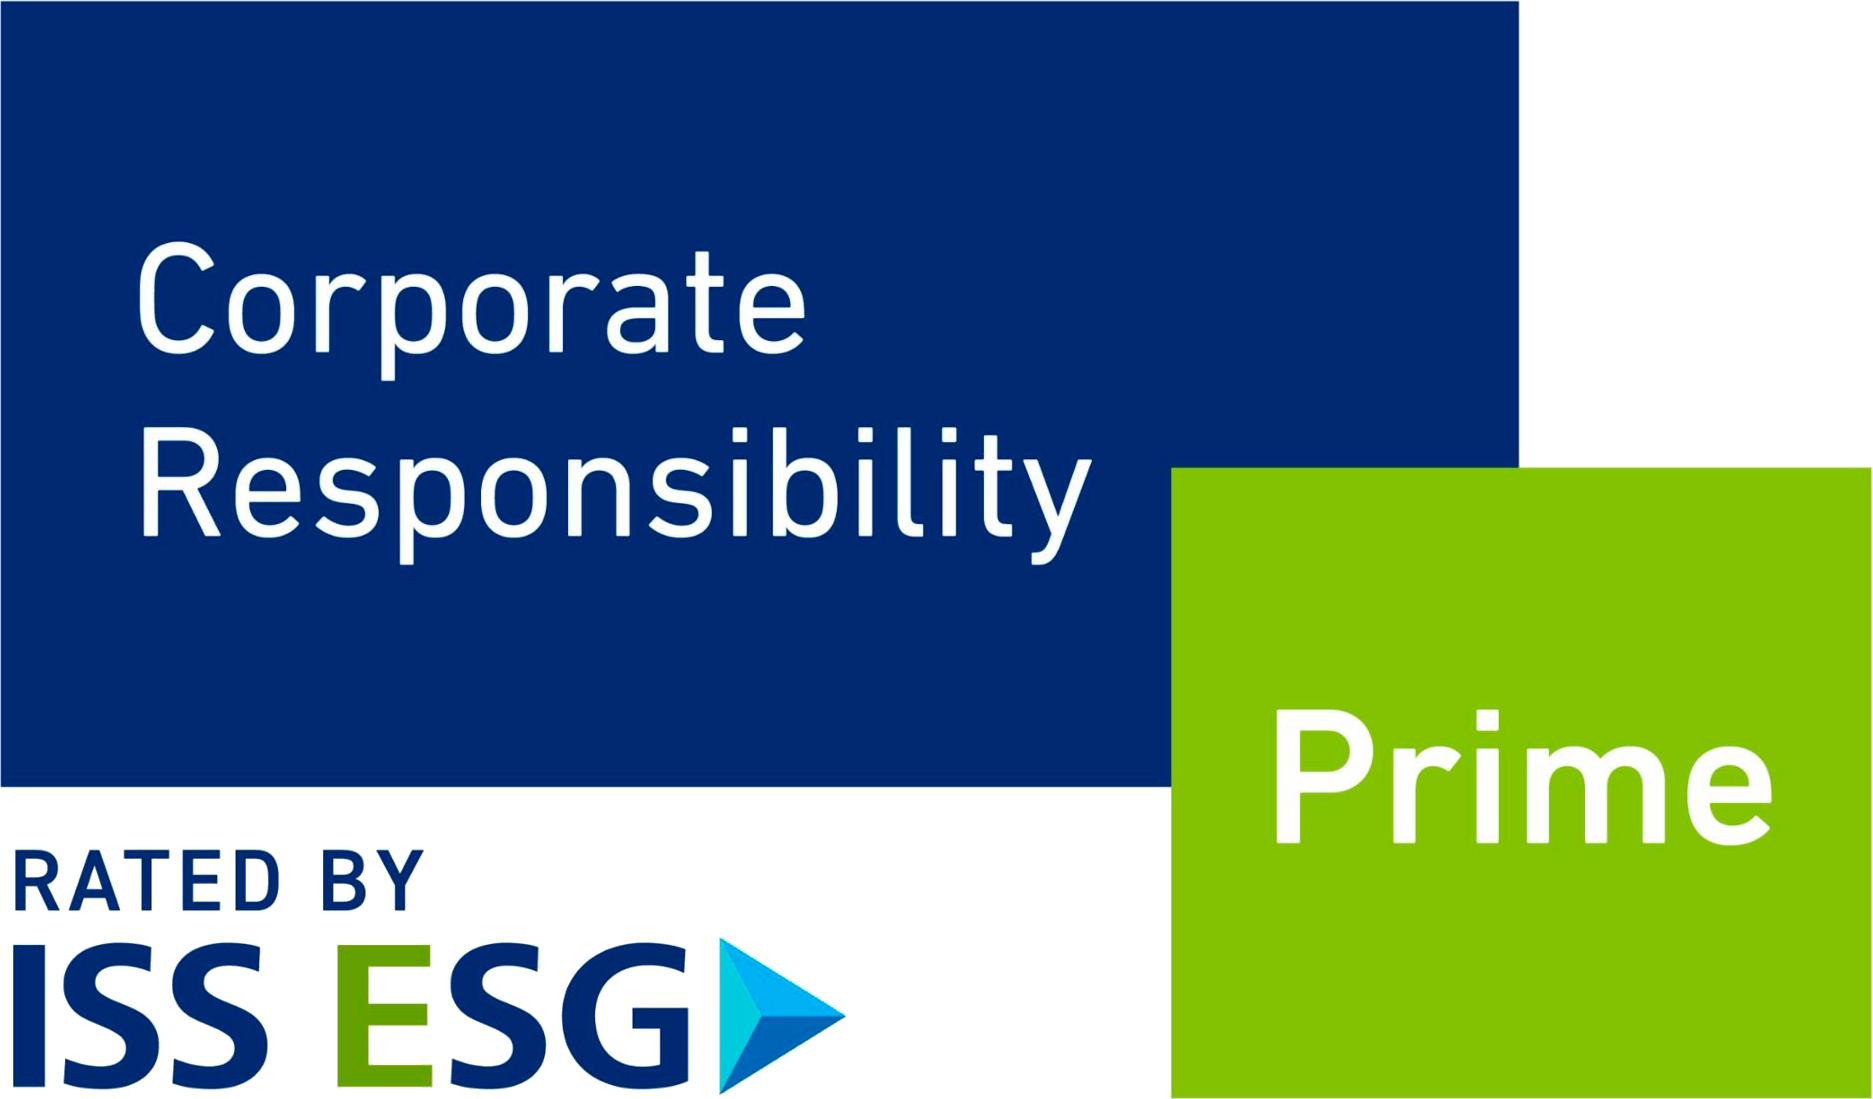 Corporate Responsibility Prime